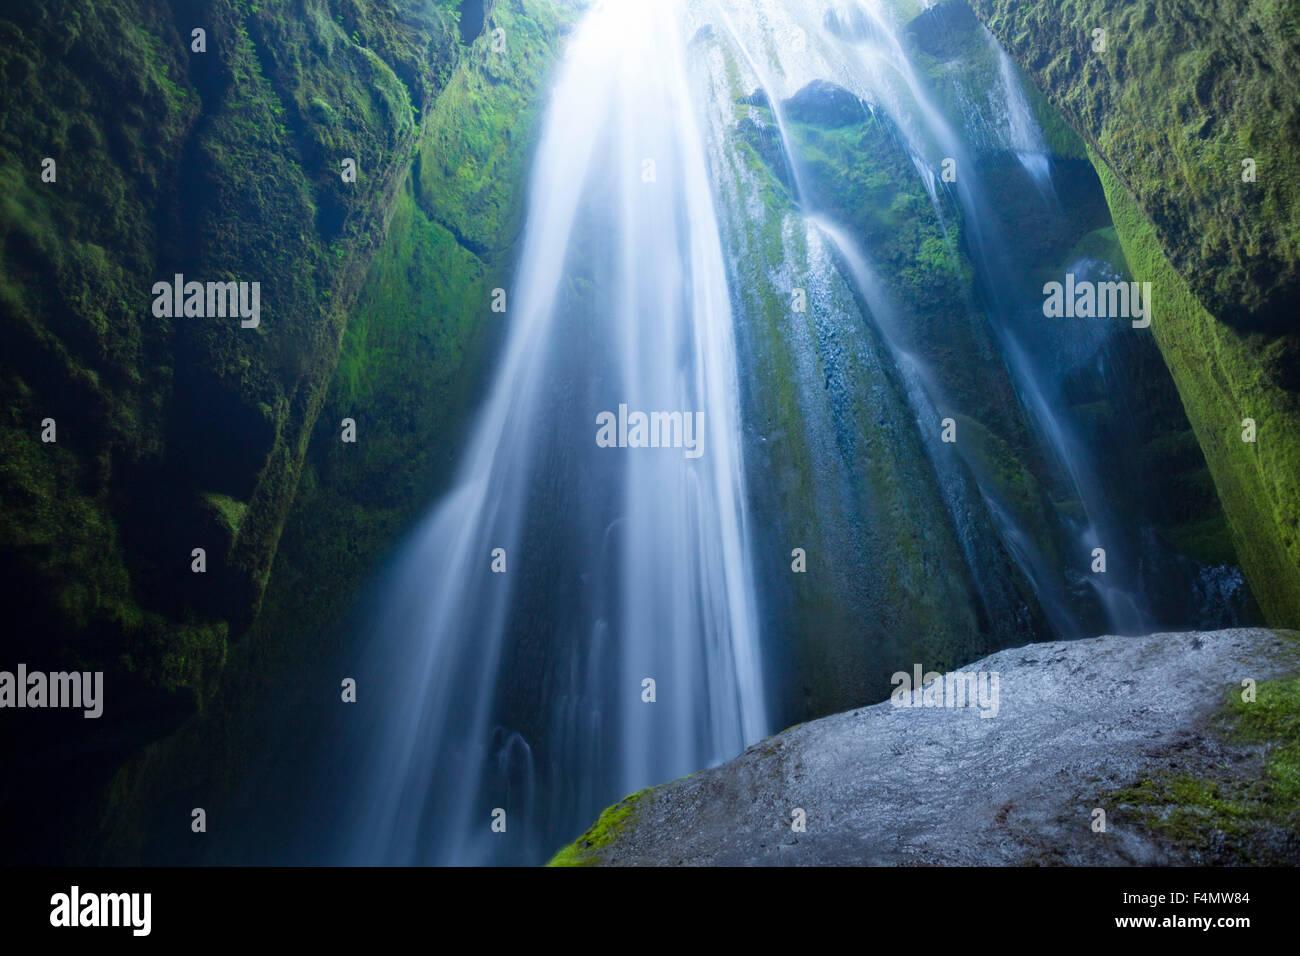 Gljufurarfoss waterfall deep within a narrow canon, Seljaland, Sudhurland, Iceland. - Stock Image